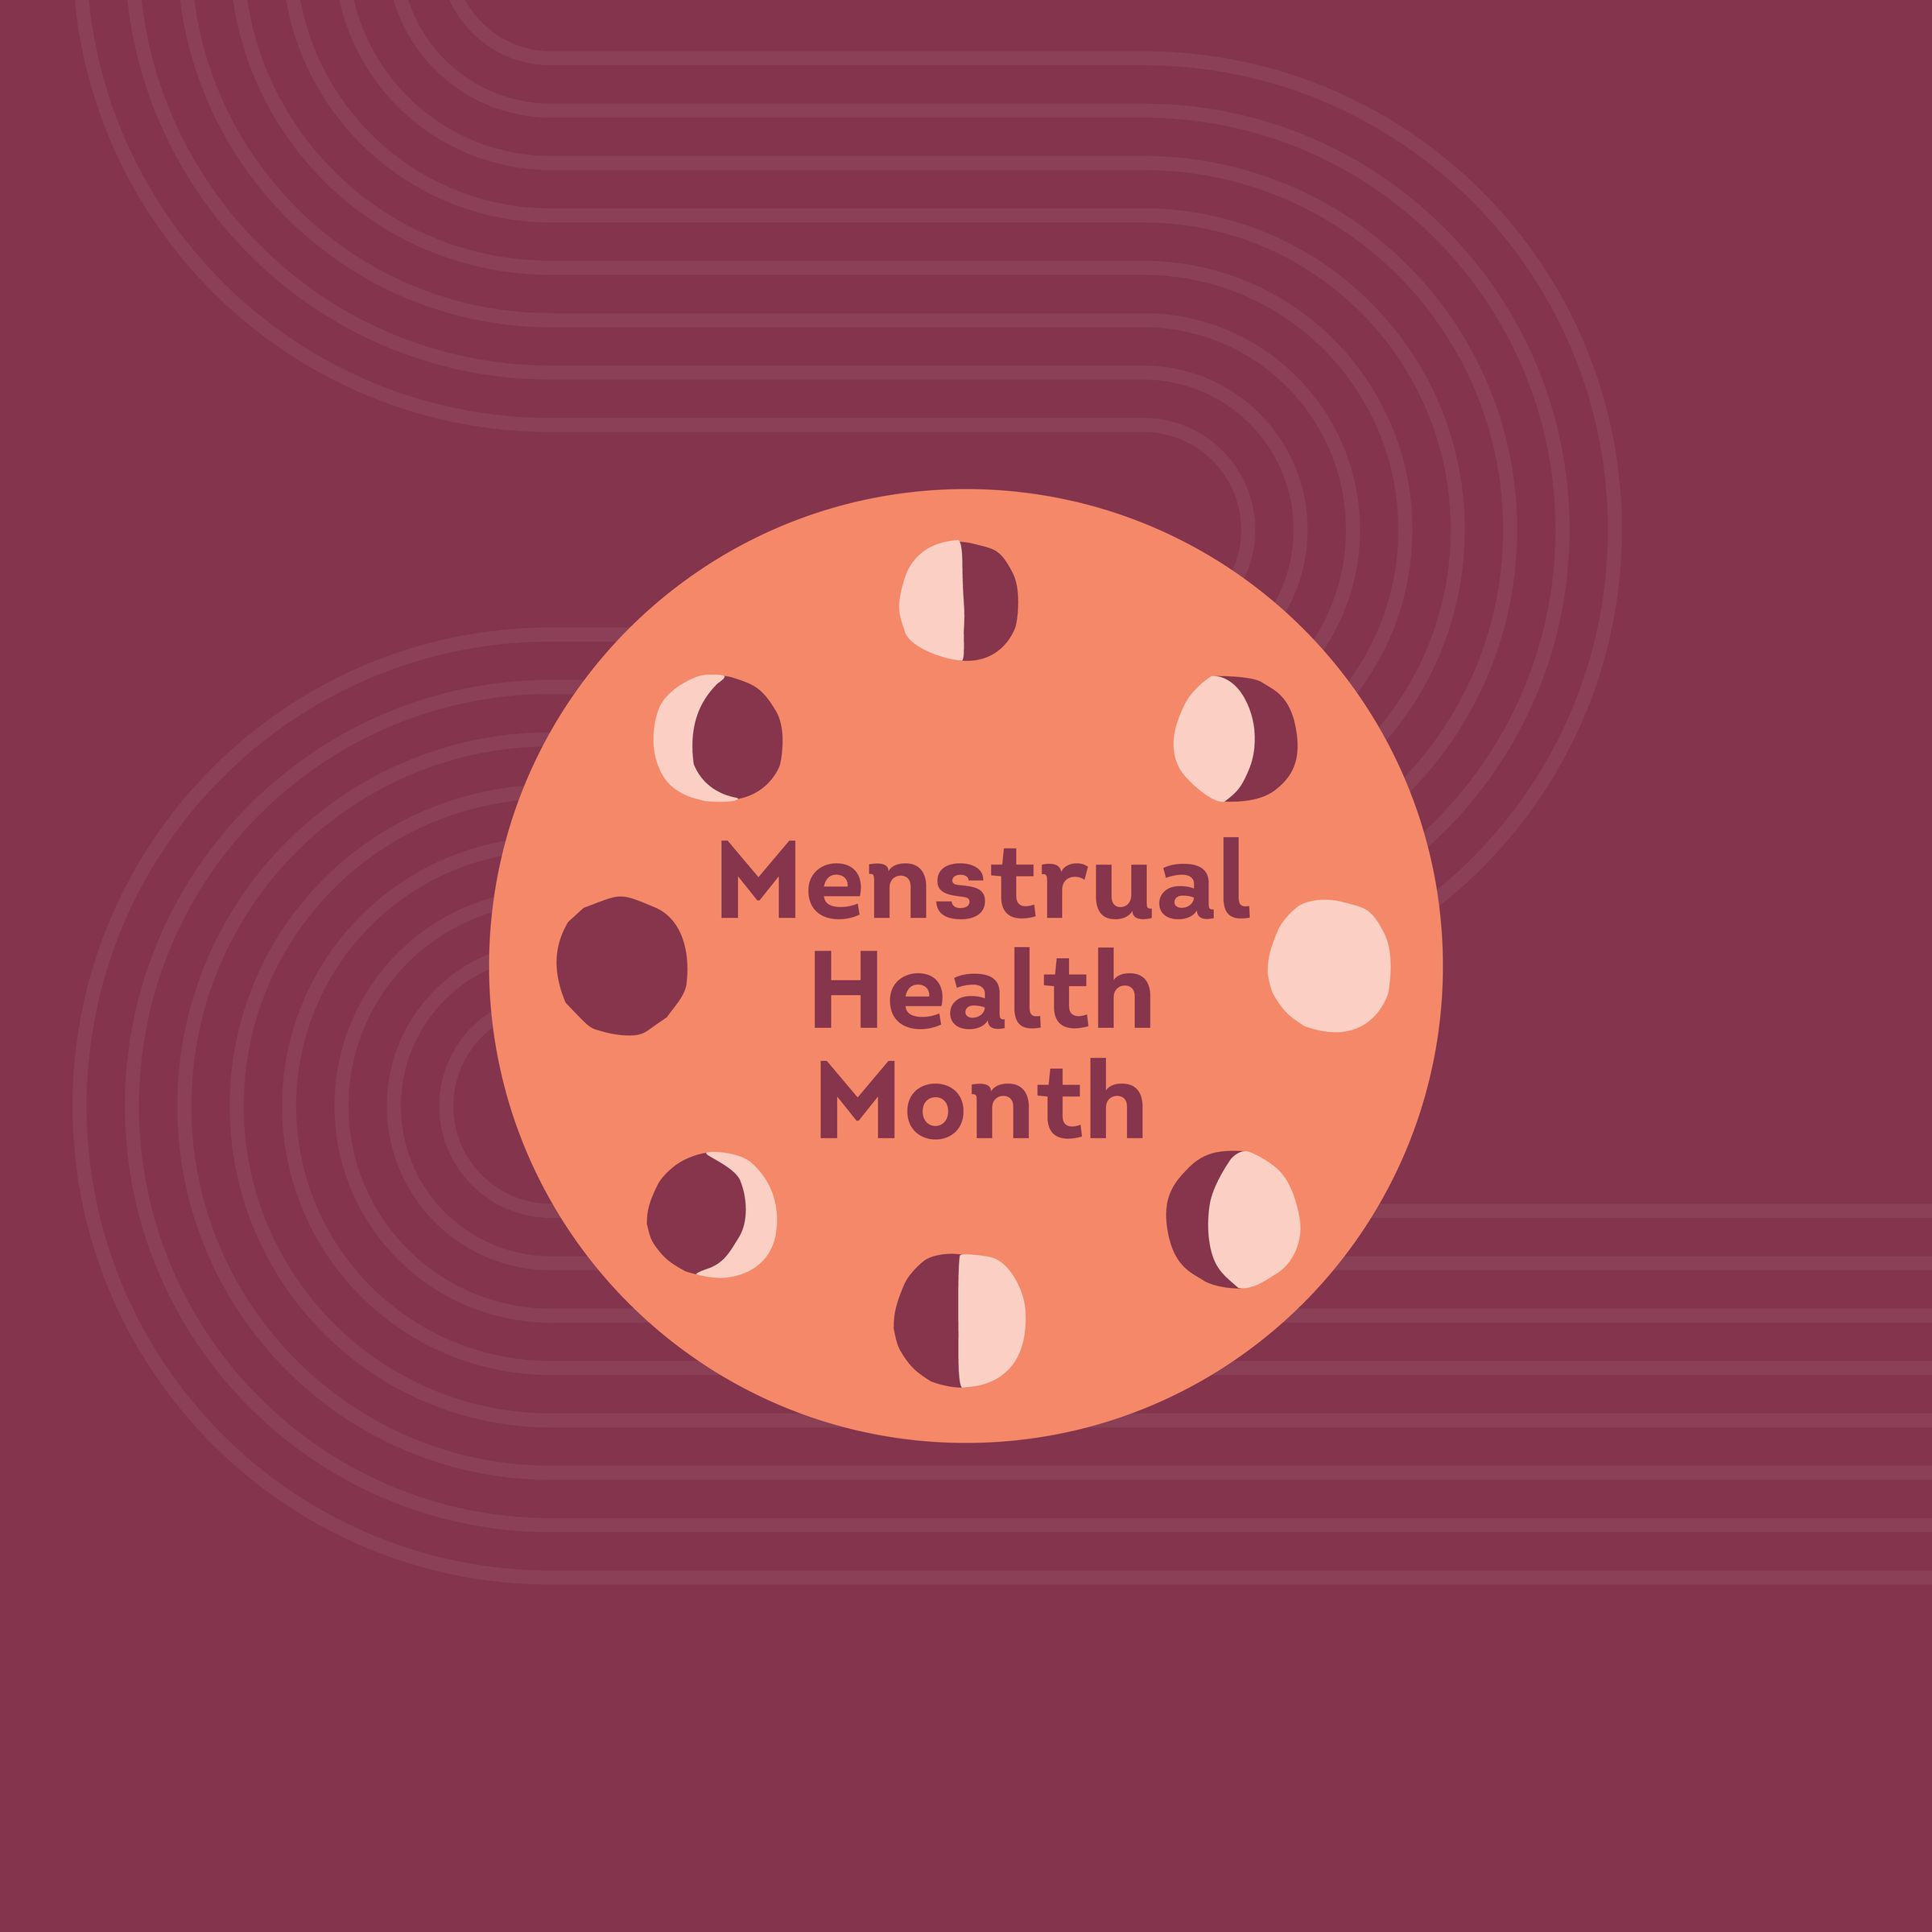 menstrual health month